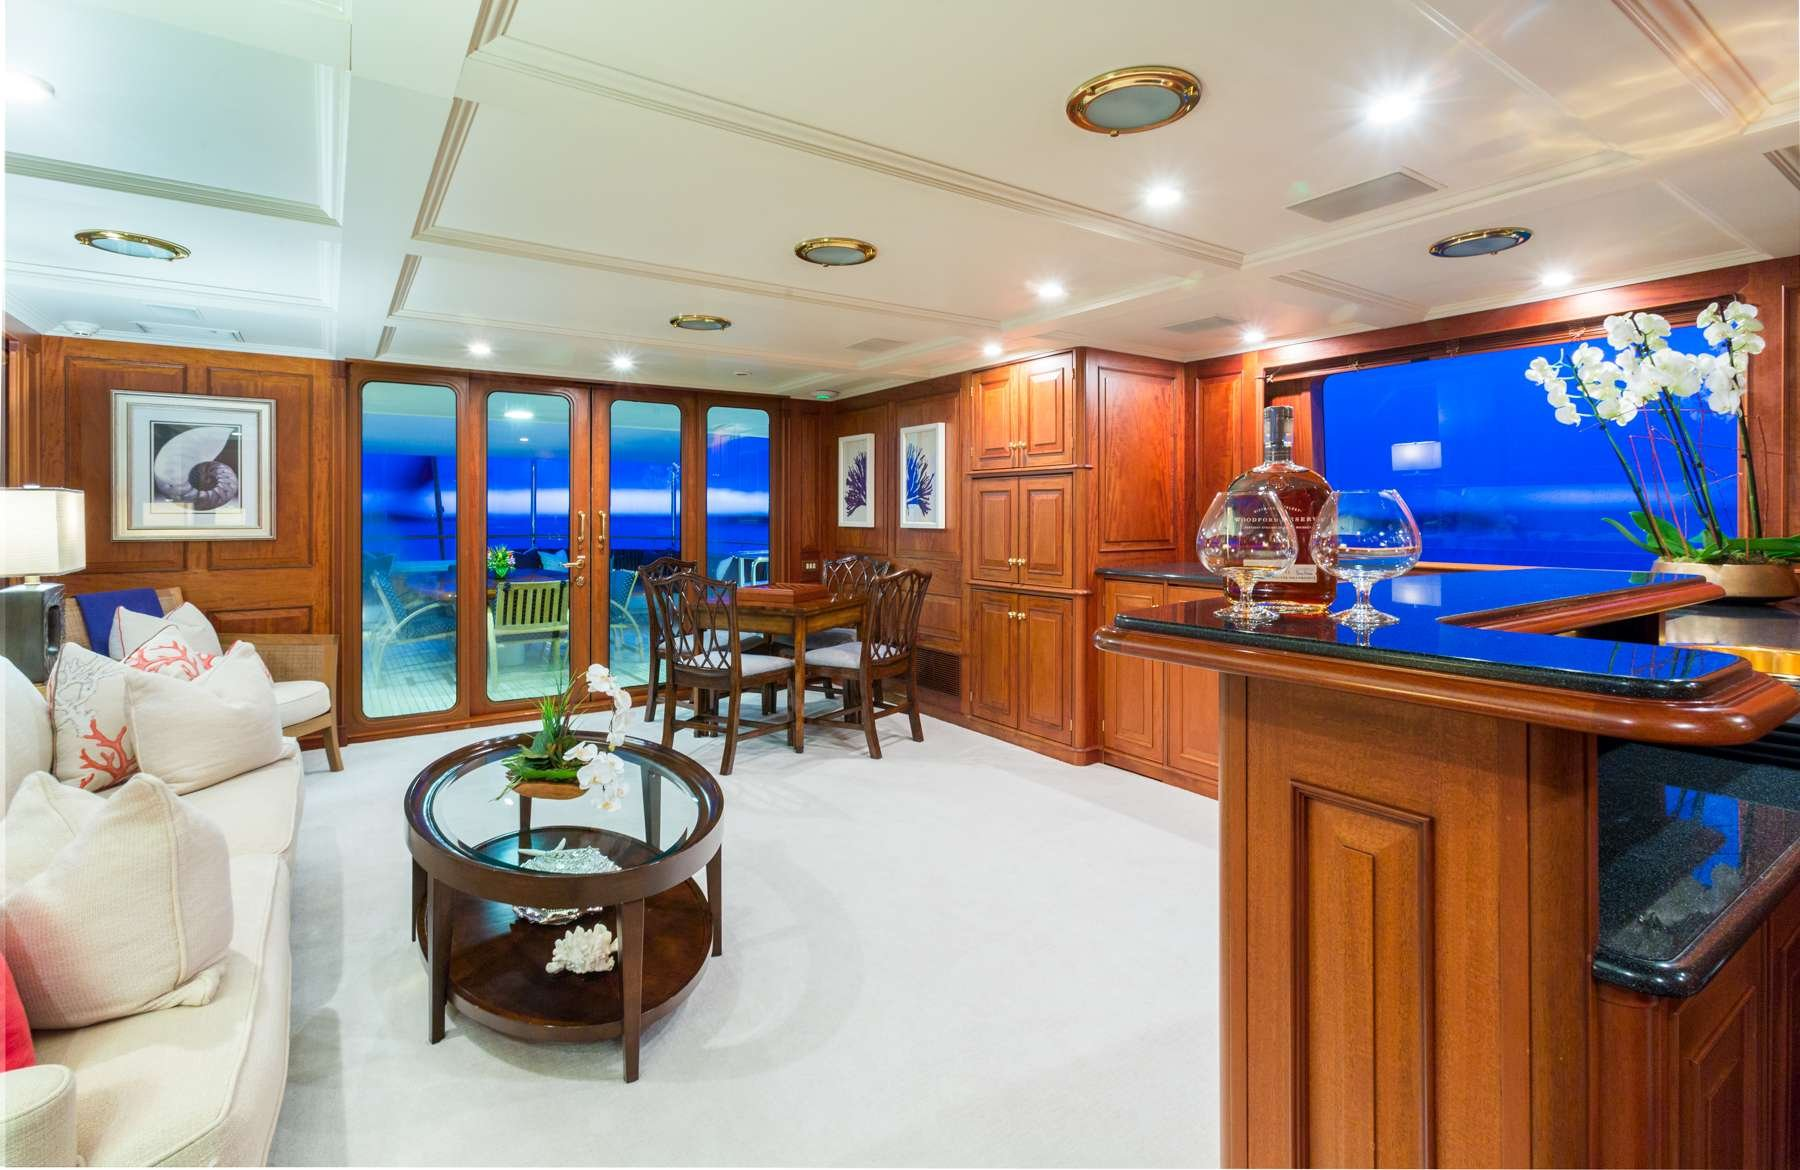 Motor Yacht 'LADY J' Skylounge, 12 PAX, 9 Crew, 142.00 Ft, 43.00 Meters, Built 1997, Palmer Johnson, Refit Year 2017